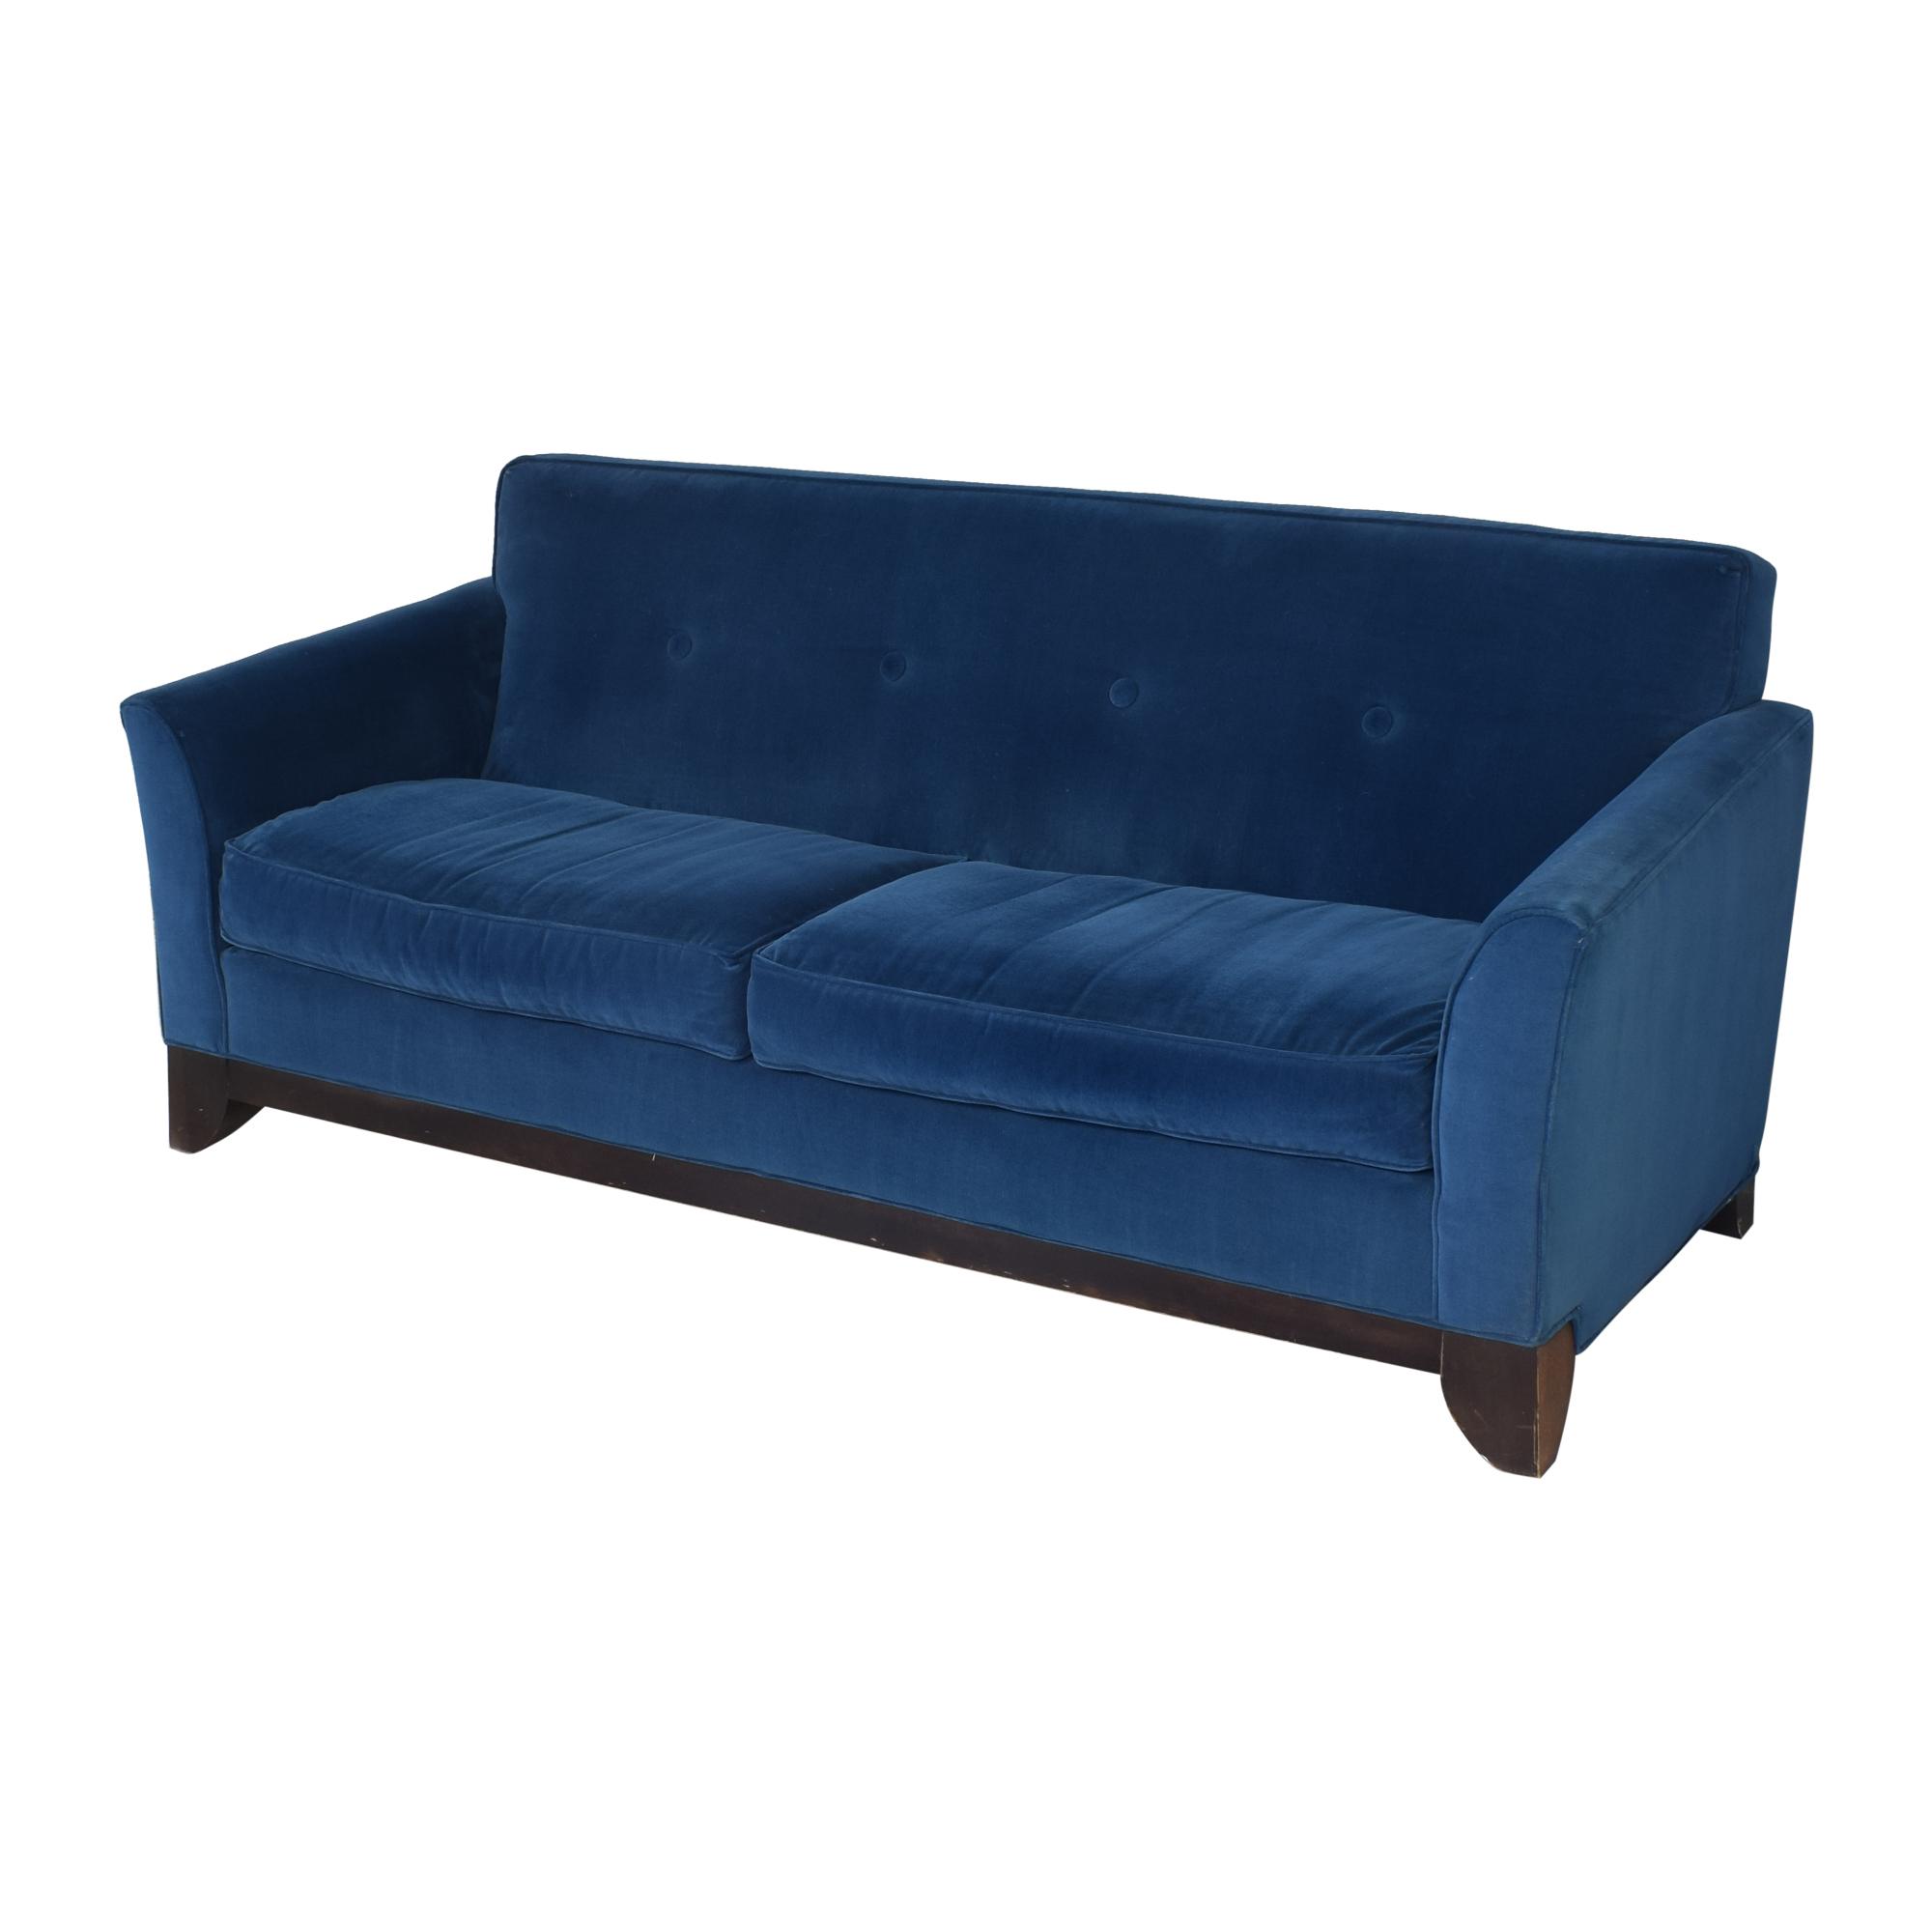 Rowe Furniture Rowe Furniture Two Cushion Sofa blue and dark brown